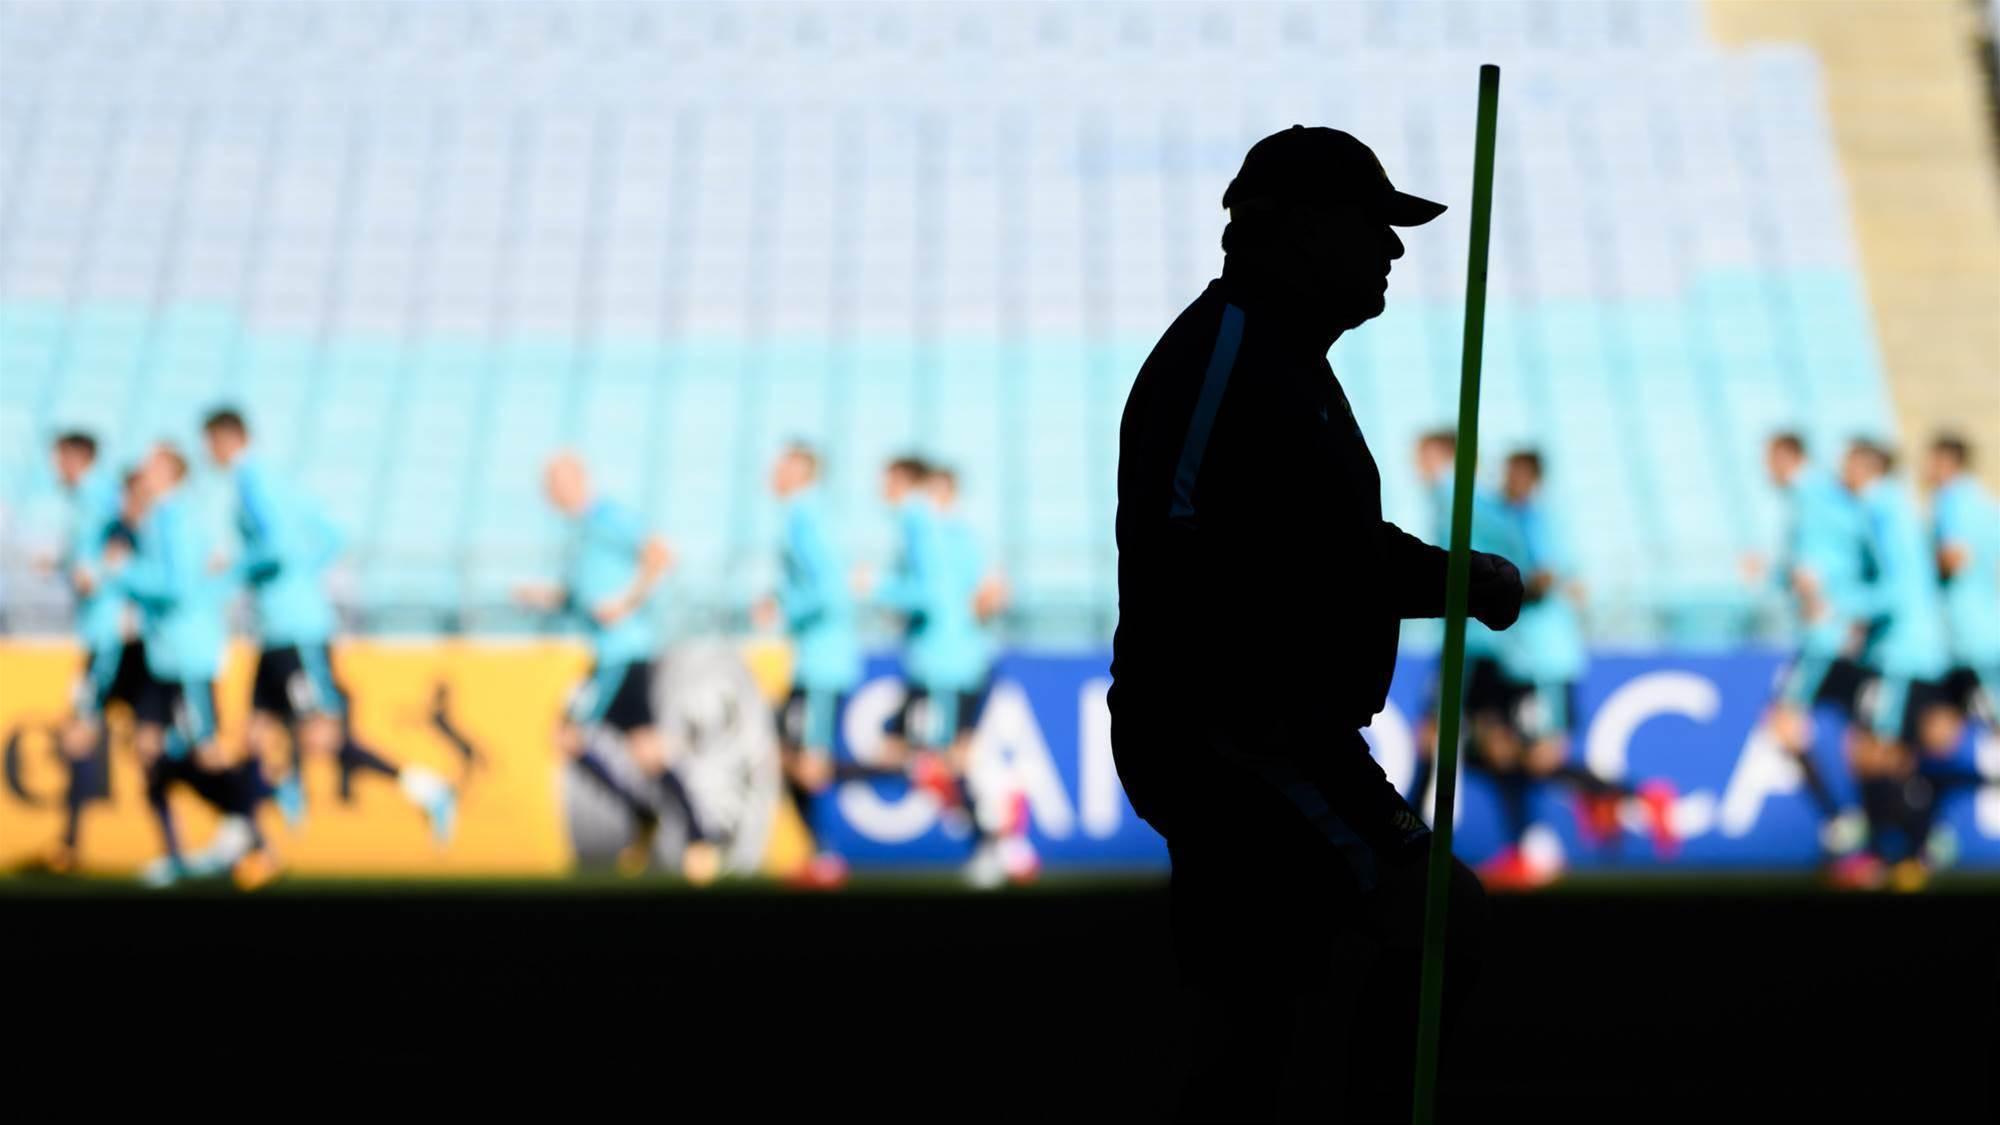 PIC SPECIAL: Socceroos get set for Honduras